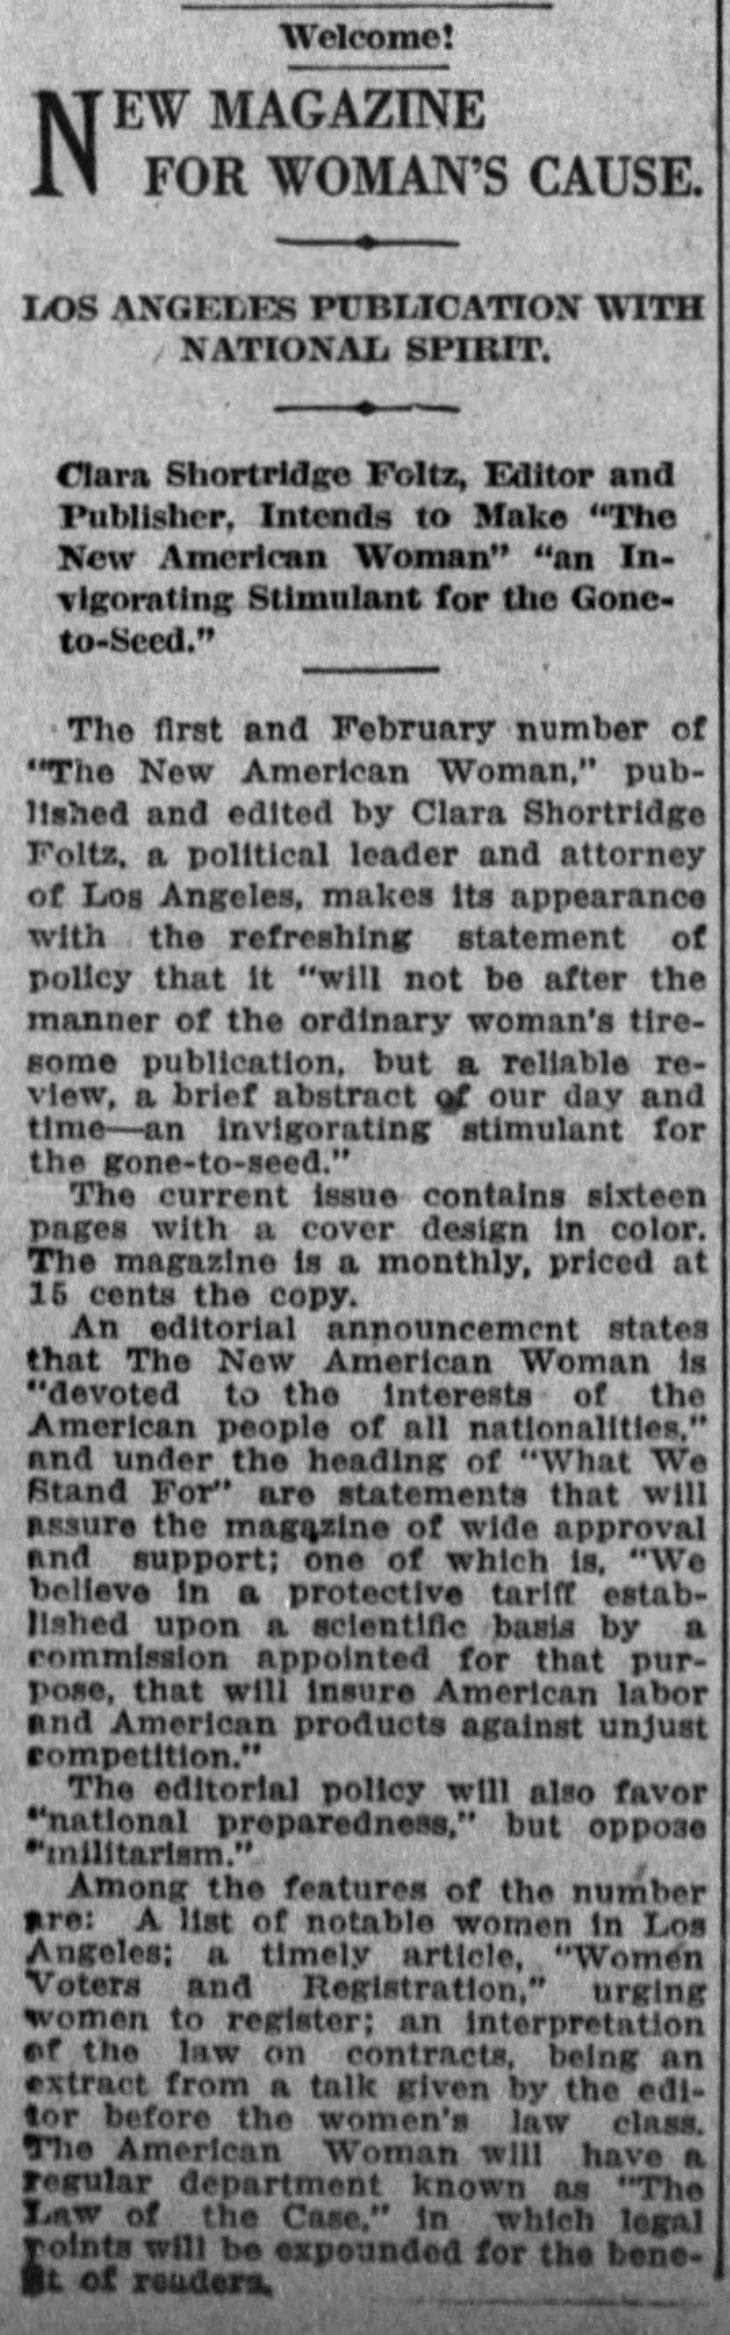 New American Woman Times_Feb_4__1916_